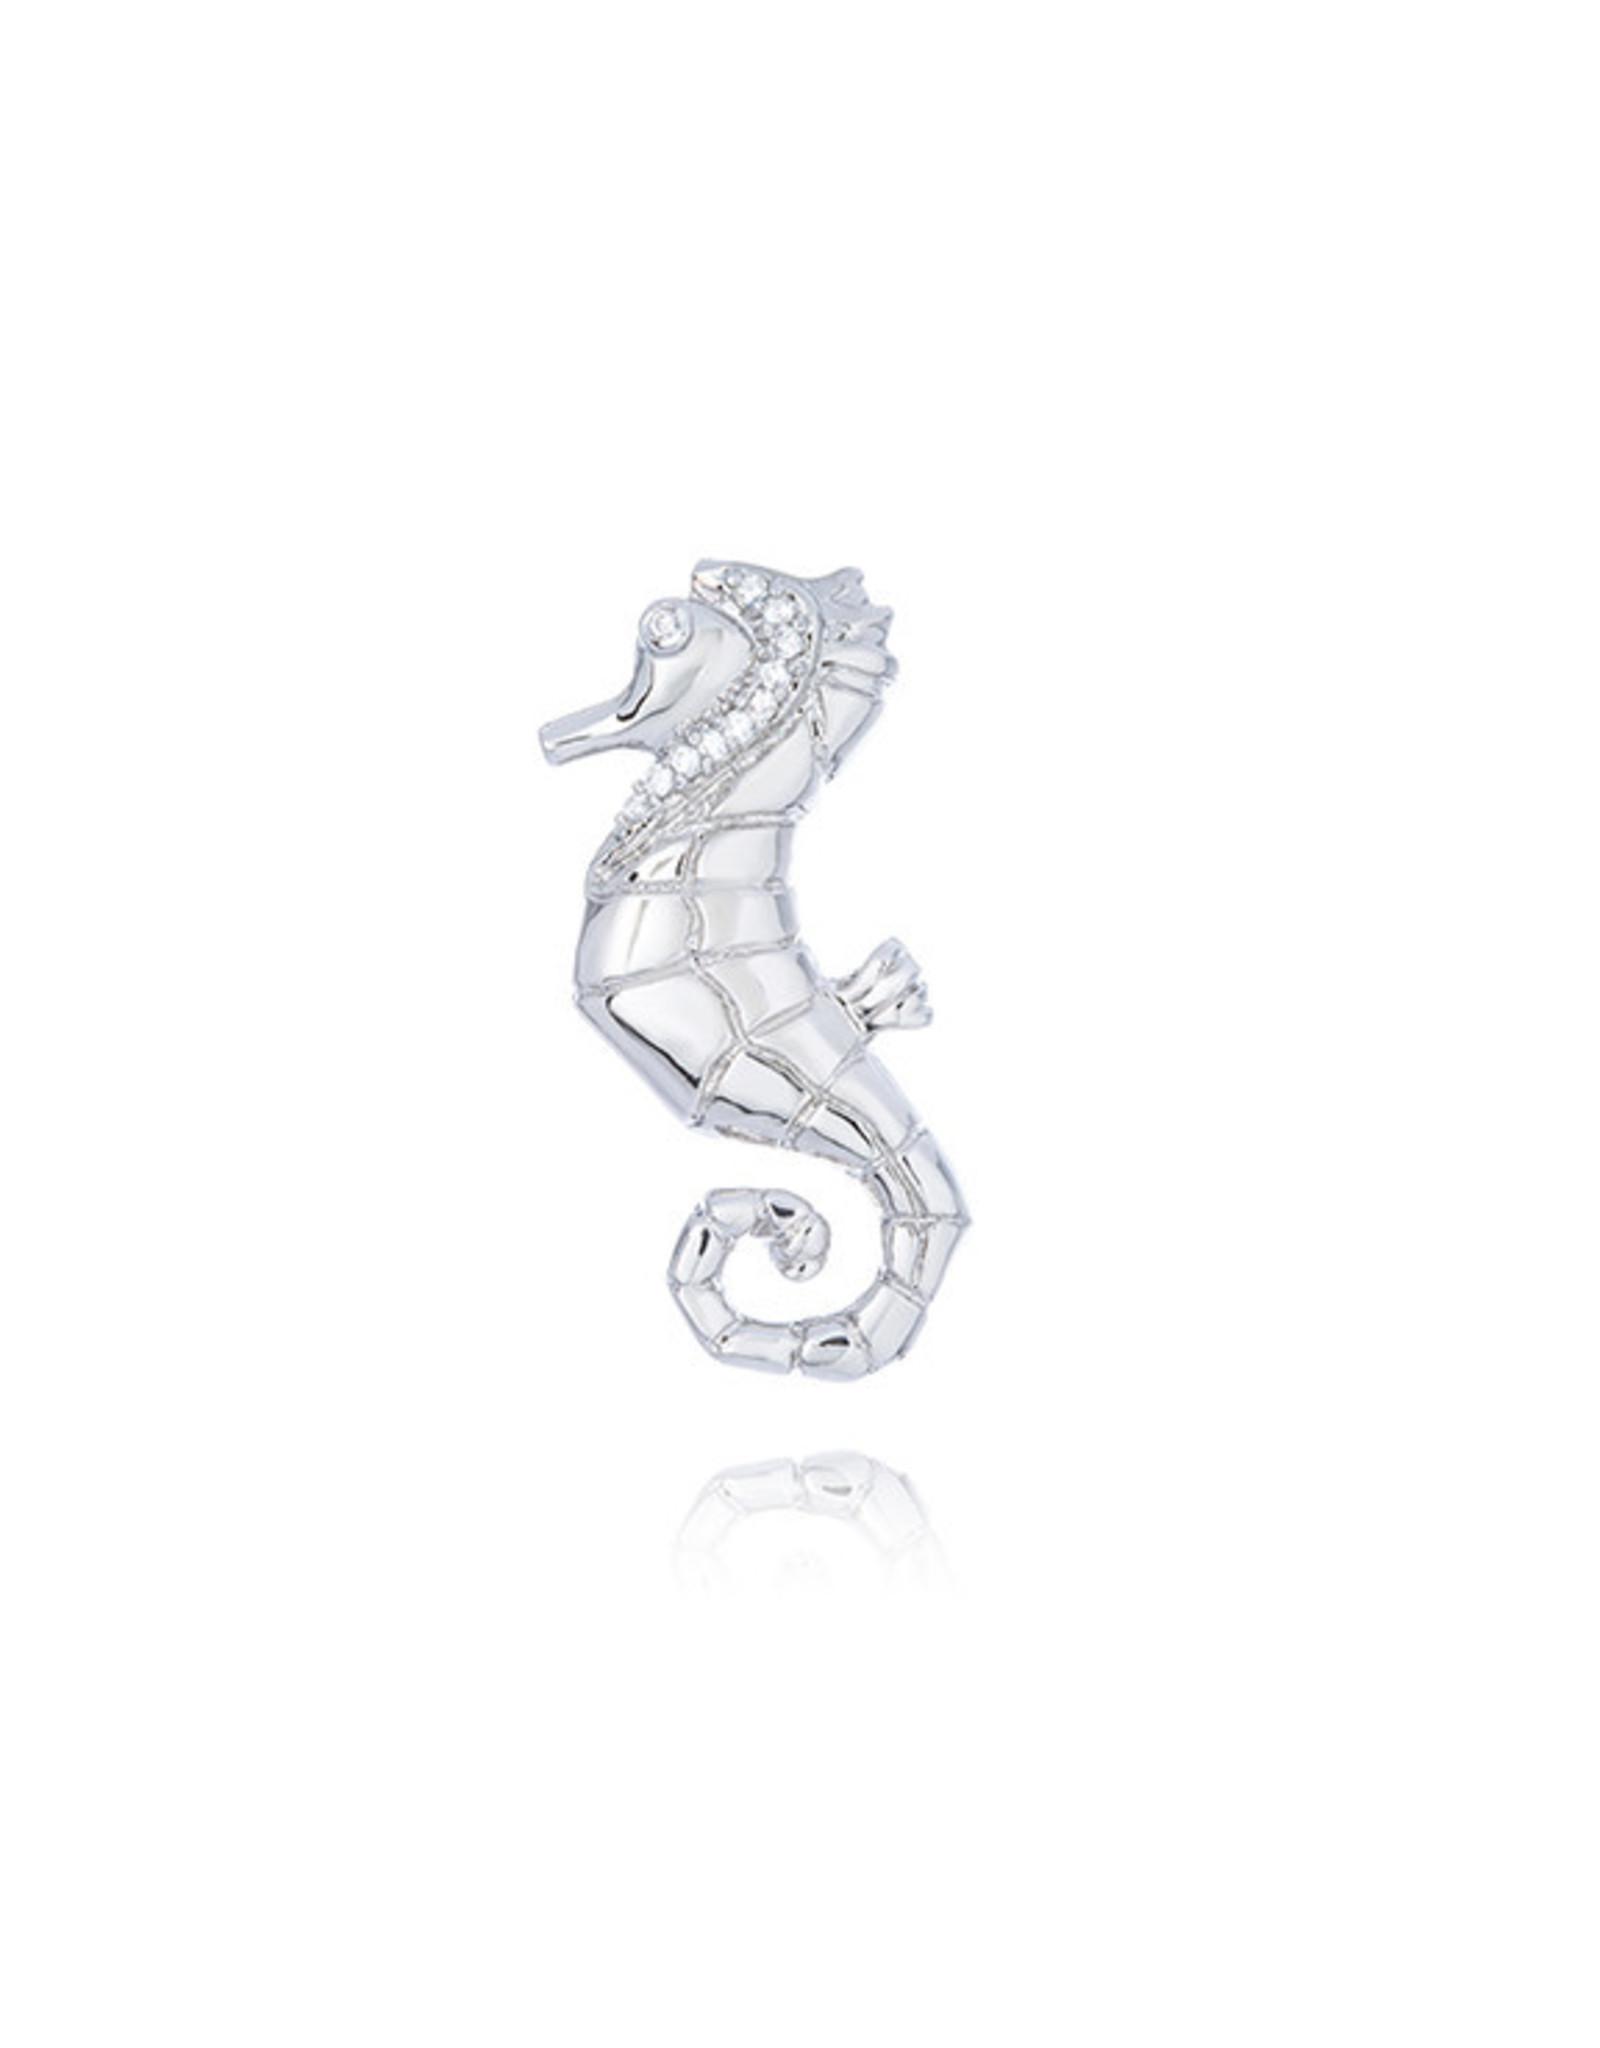 CZ Seahorse Broach/Pendant